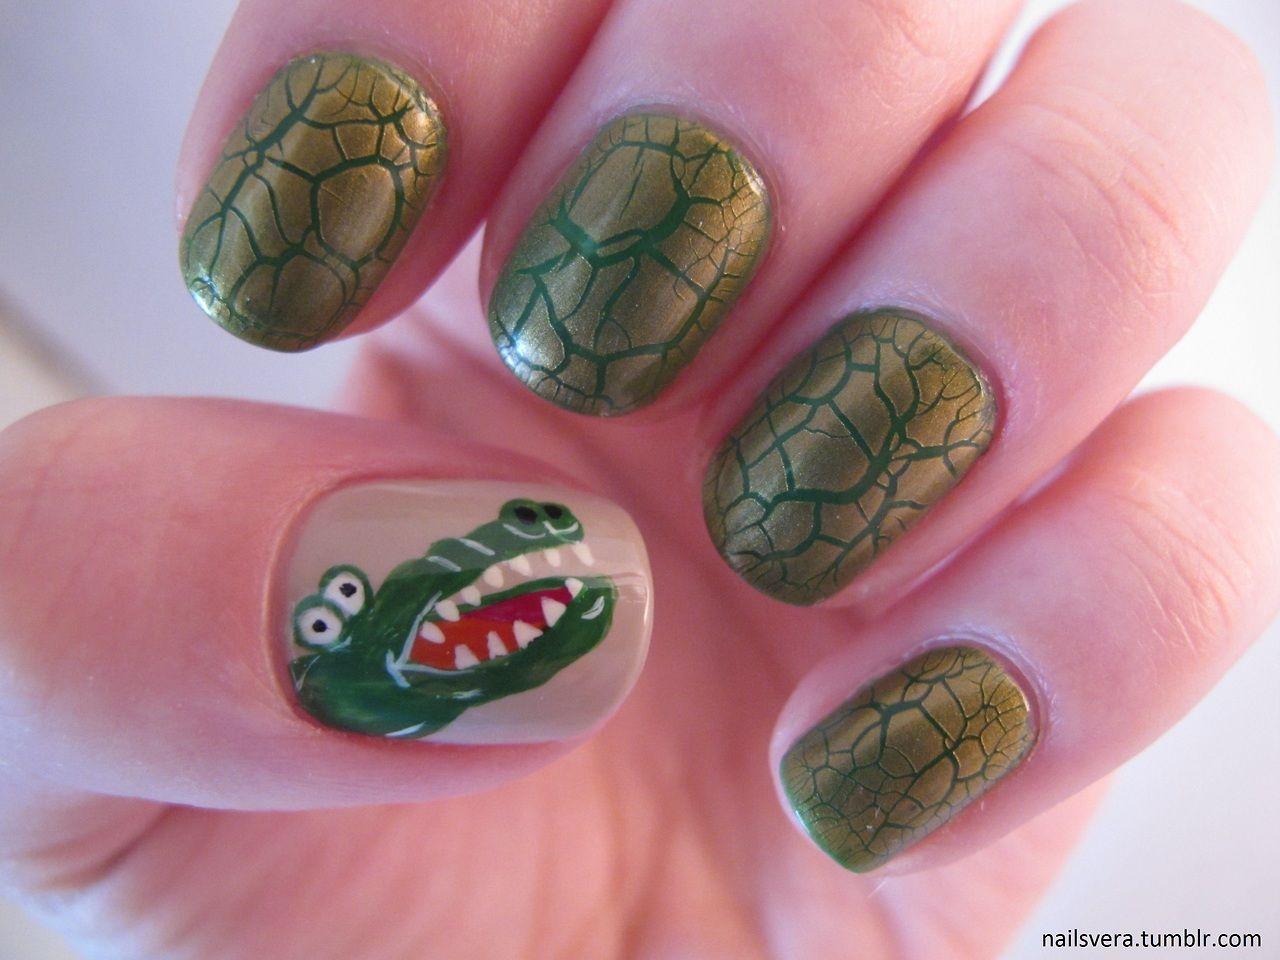 Alligator head #nail art #polish | nail designs | Pinterest | Nail ...